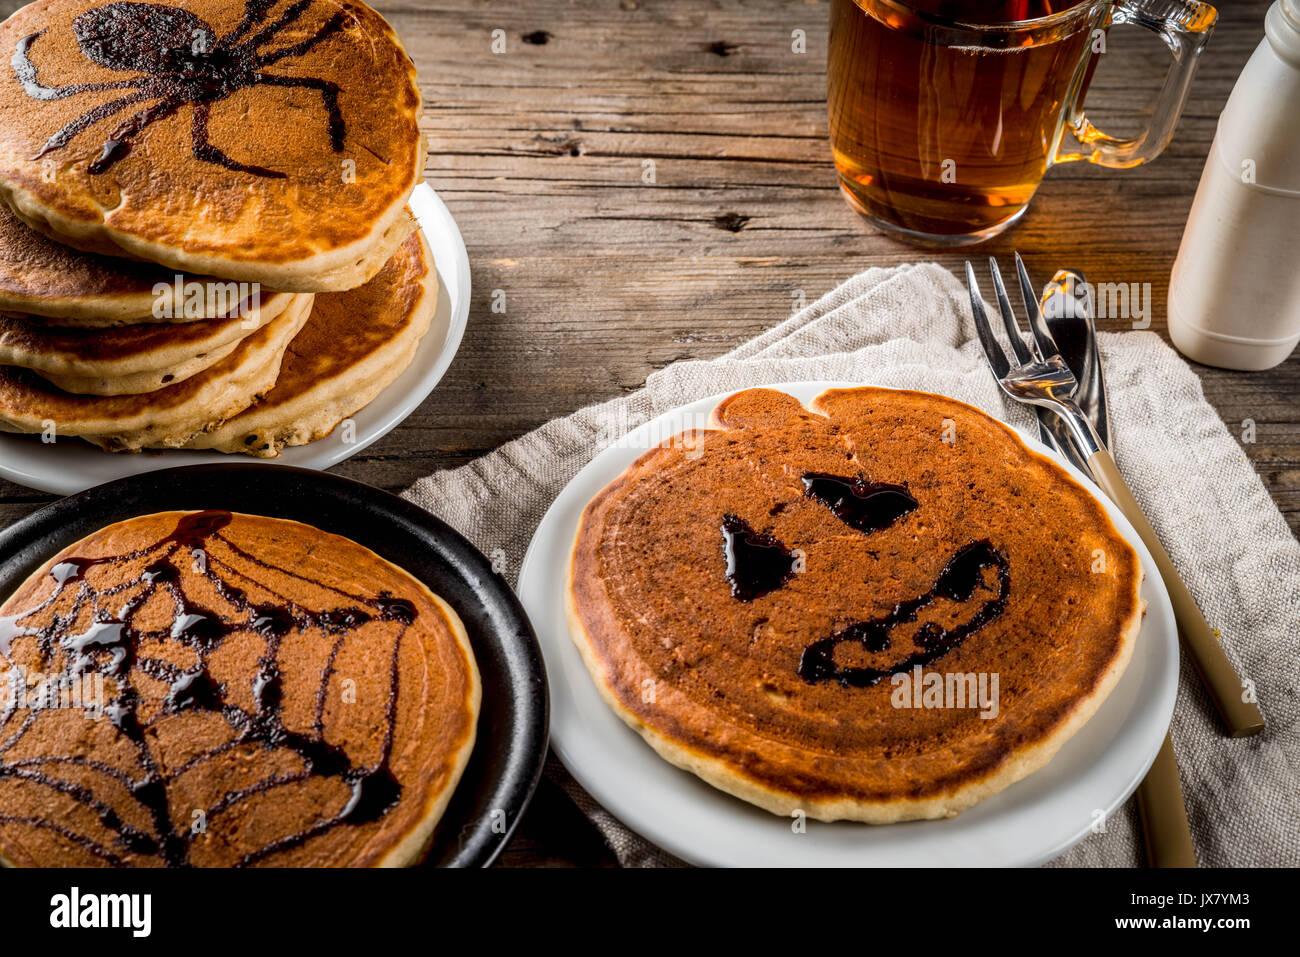 Halloween Ideen Essen.Ideen Fur Fruhstuck Sind Halloween Essen Fur Kinder